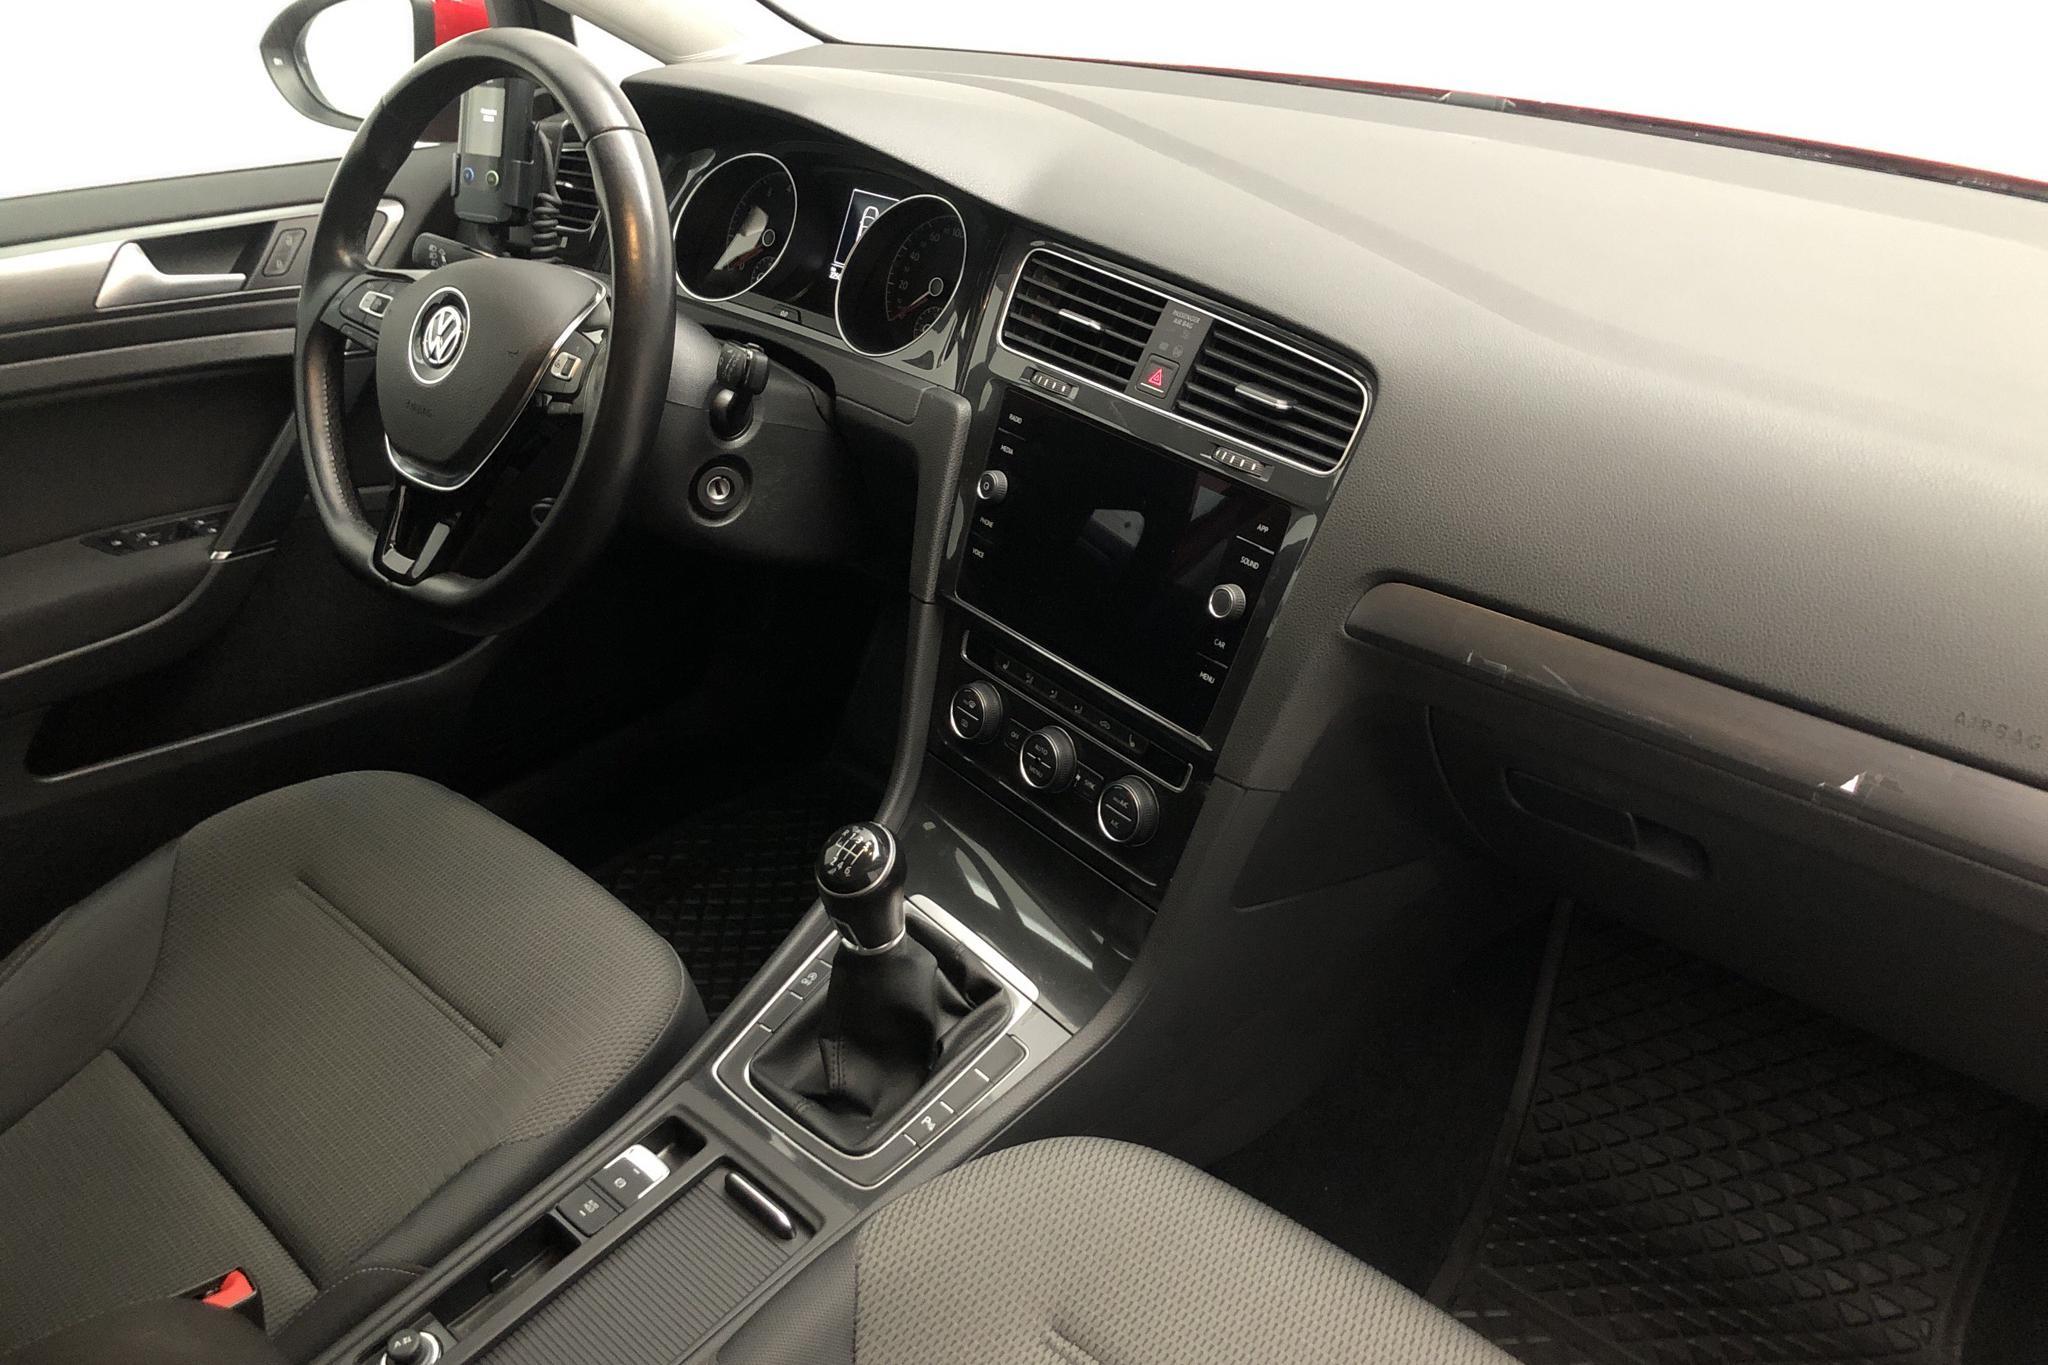 VW Golf VII 1.4 TSI Multifuel 5dr (125hk) - 2 250 mil - Manuell - röd - 2018